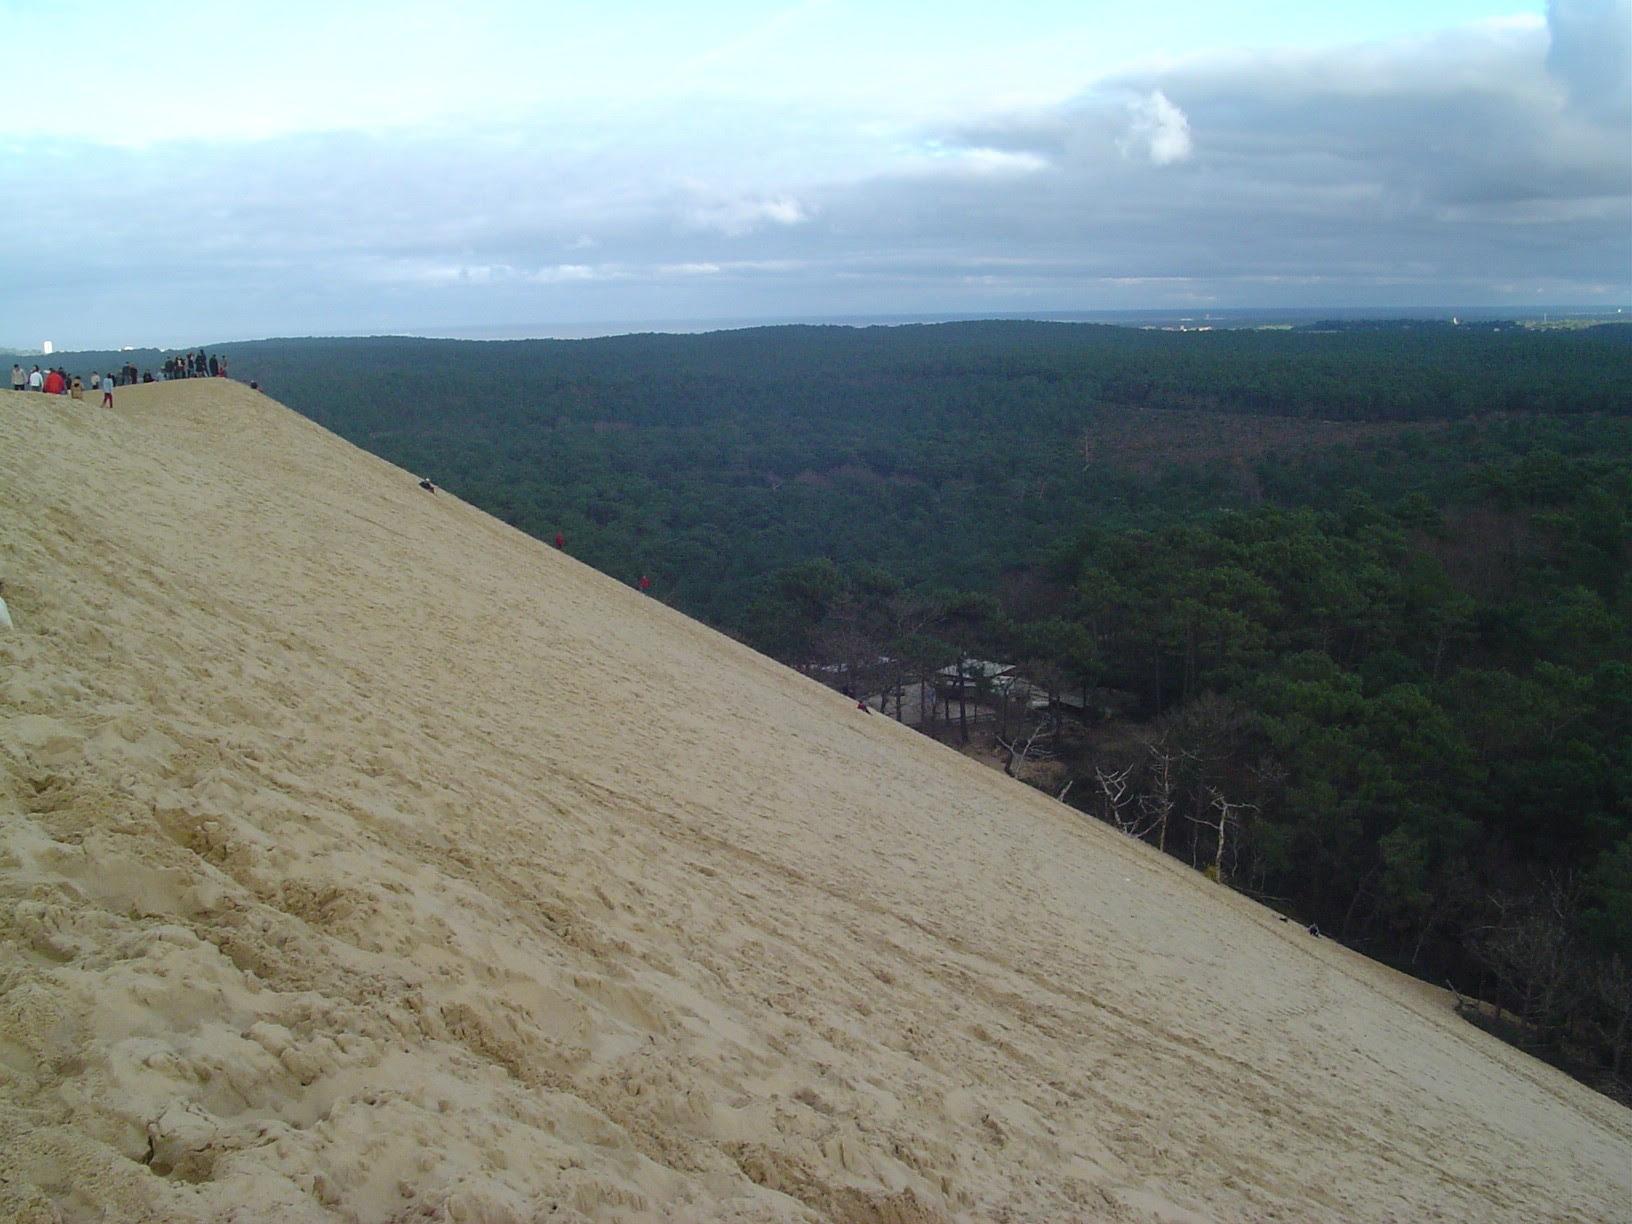 Jc1cN Dune de Pyla   A new Sahara desert being born   in France! [30 pics]